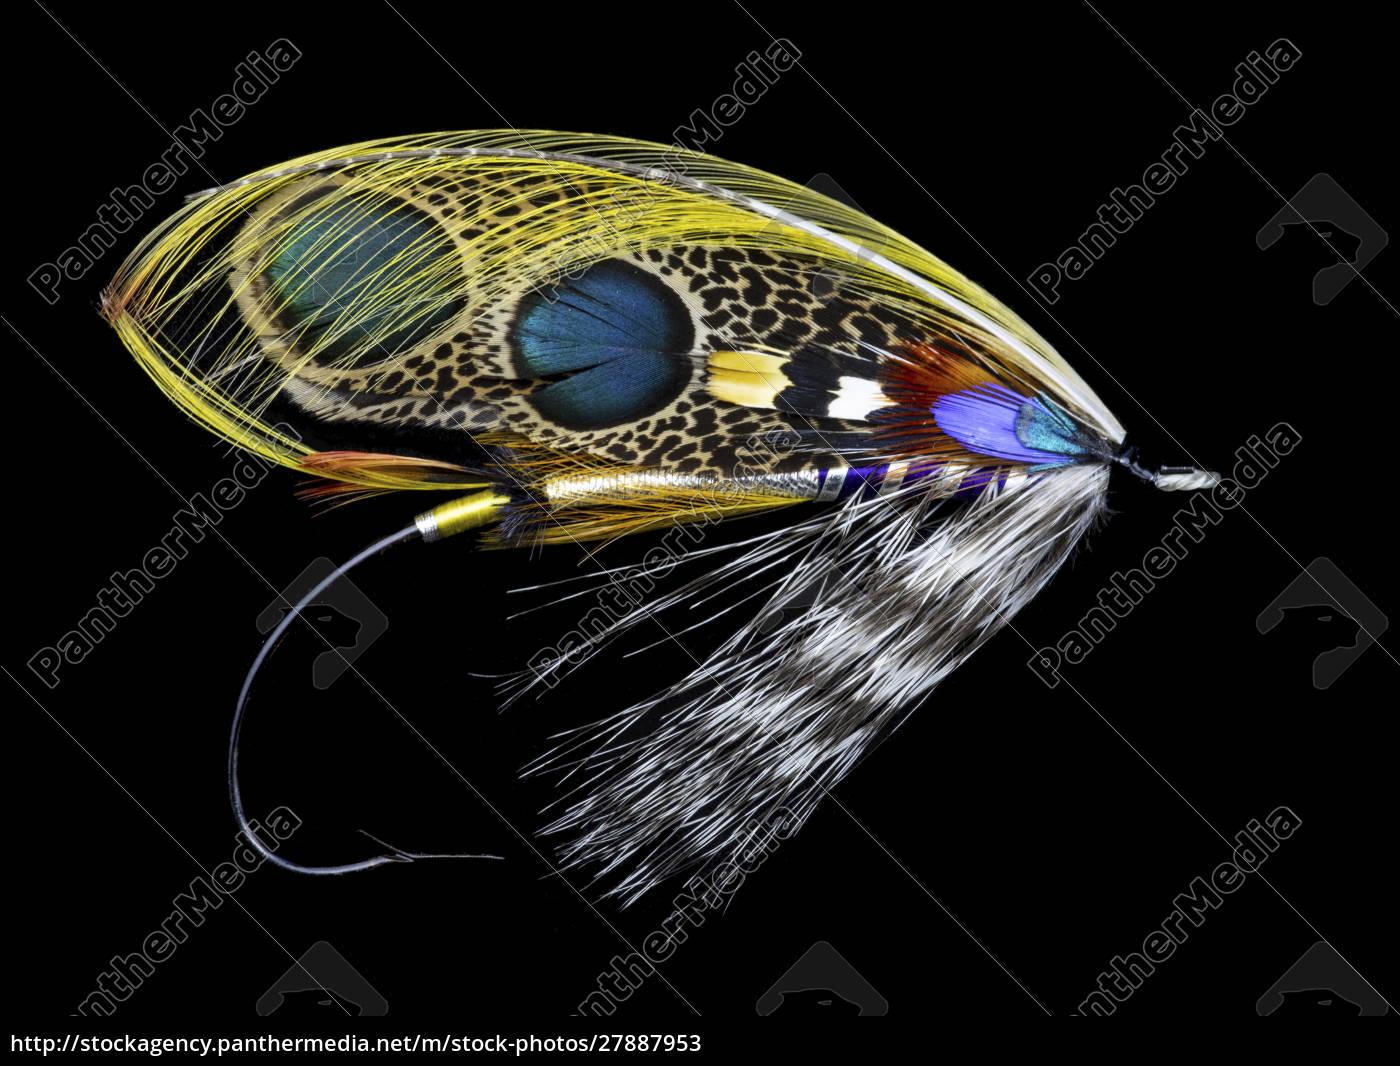 atlantic, salmon, fly, designs, 'double, leopard' - 27887953